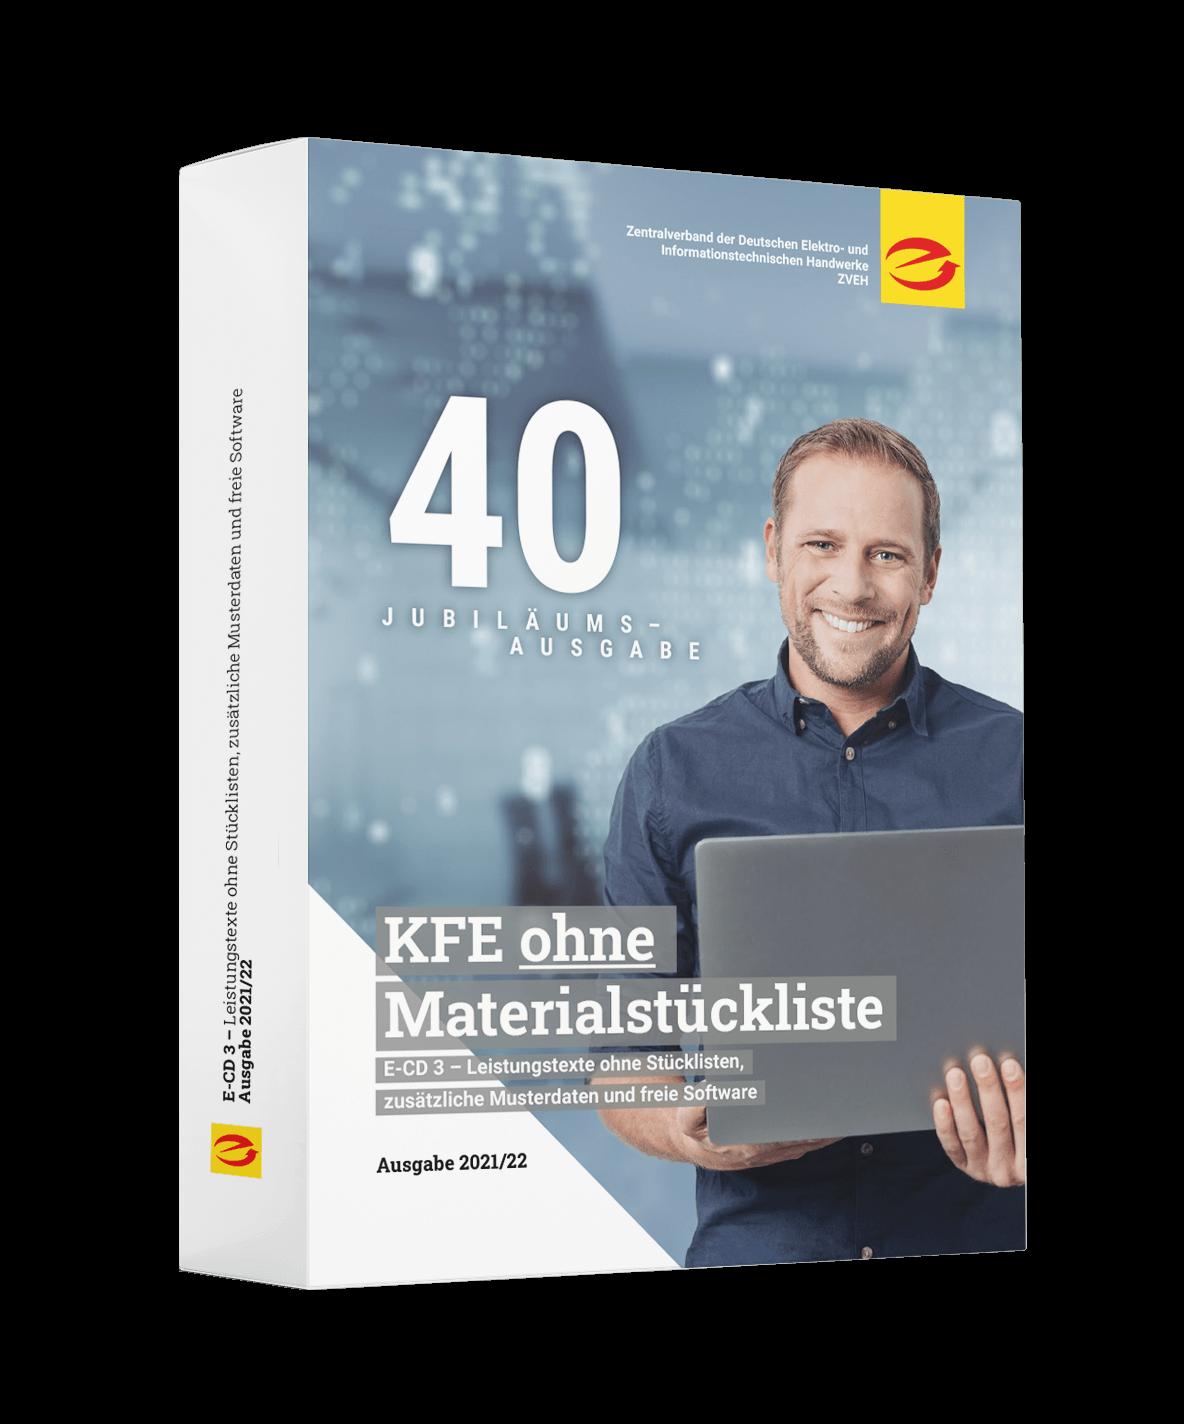 KFE-Daten ohne Materialstückliste, Ausgabe 2021/22 (Lieferung ca. September 2021)